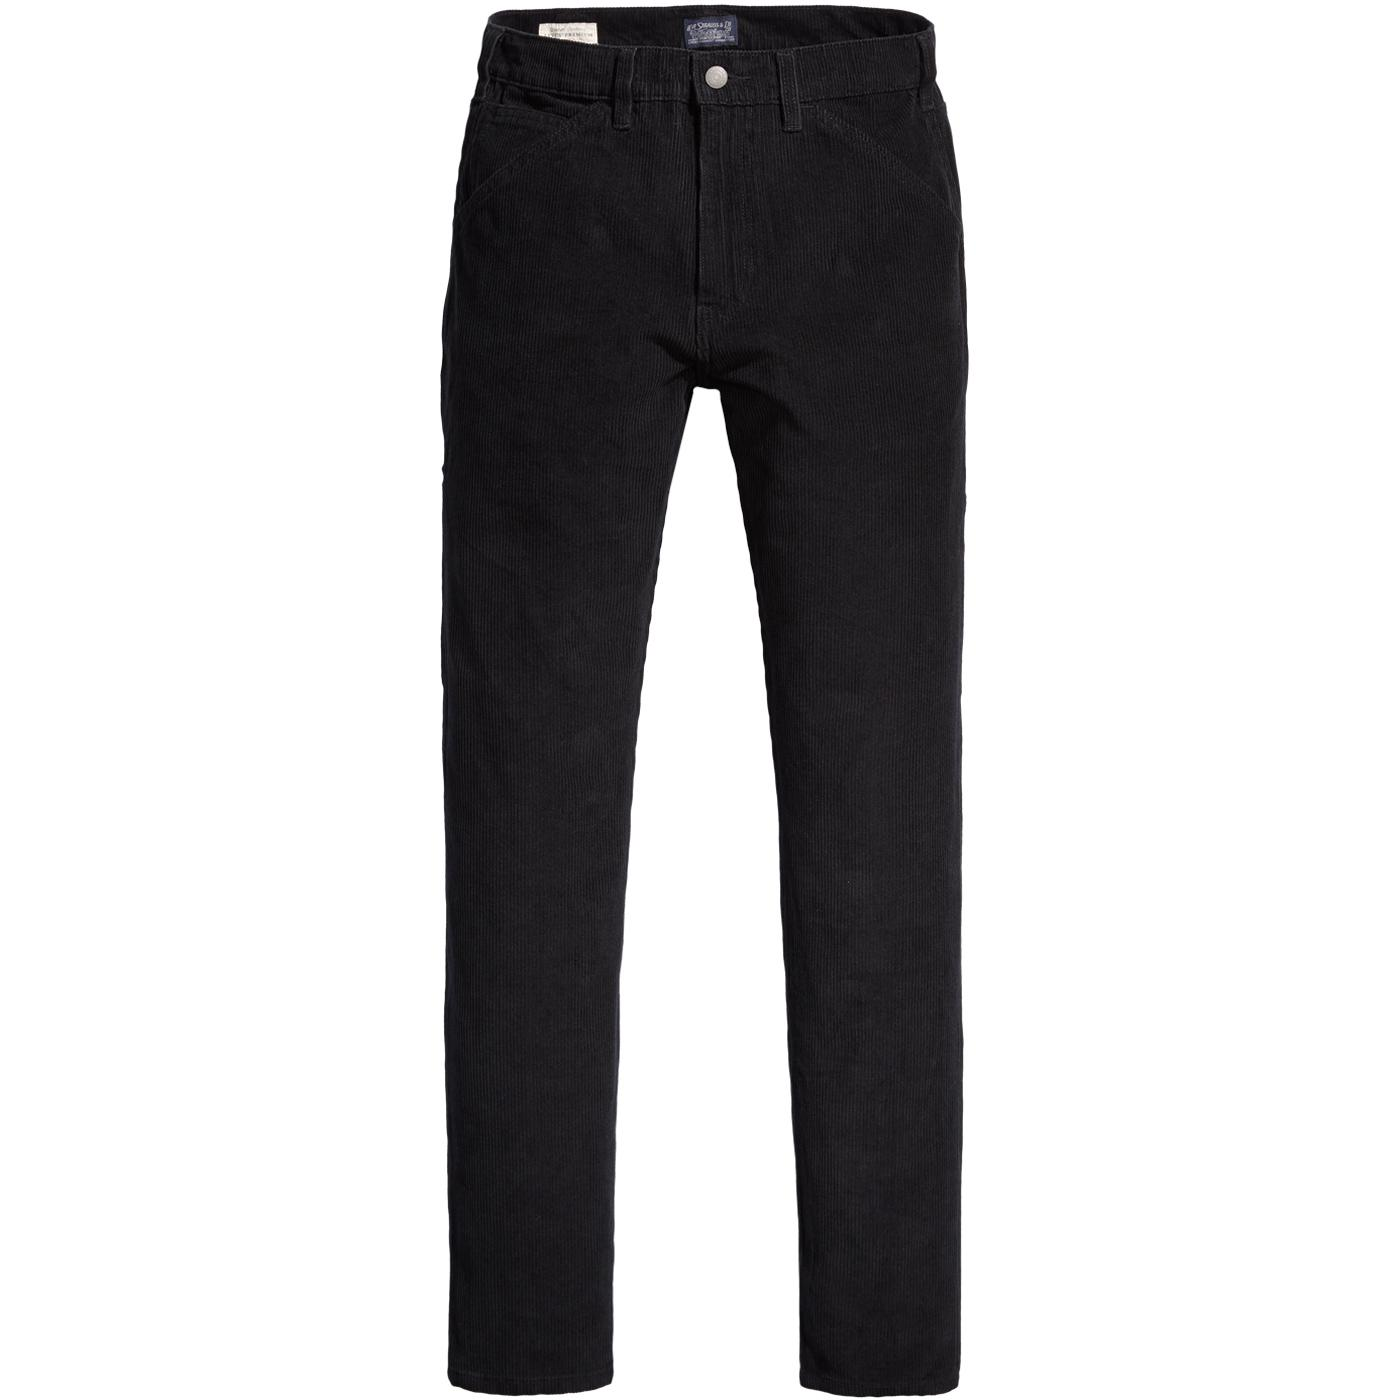 LEVI'S 502 Carpenter Slim Taper Cord Pants (Black)